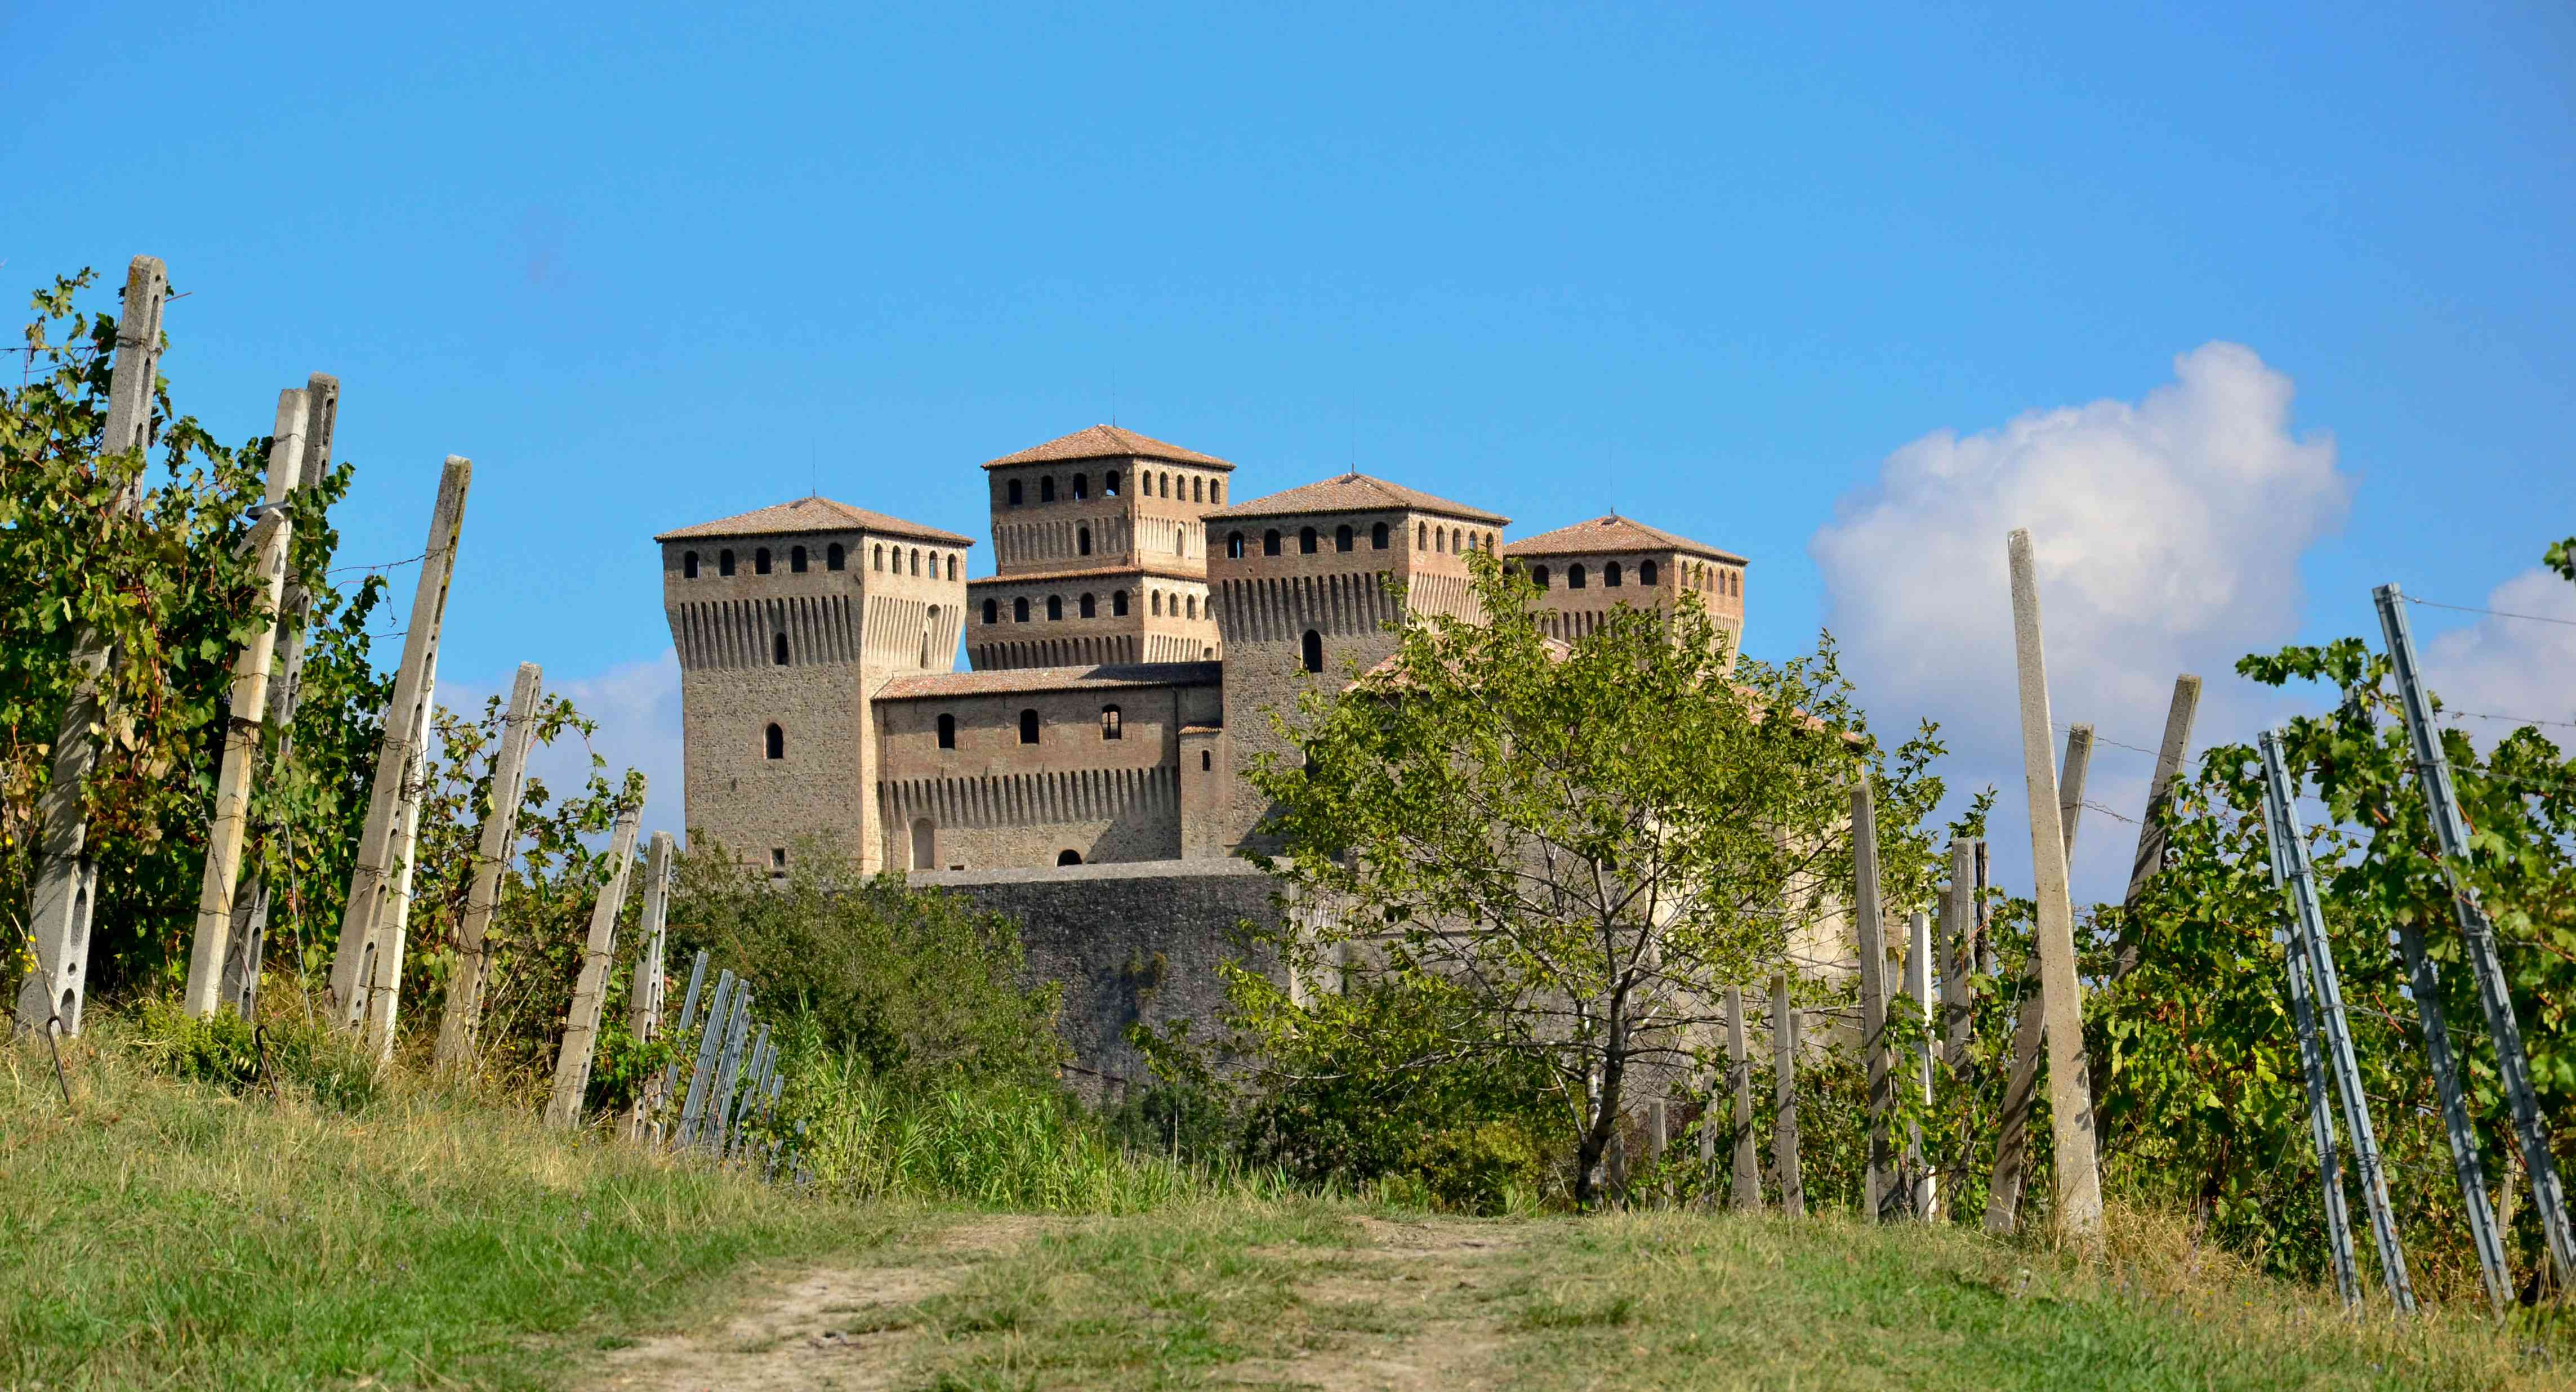 vigna_castello_4